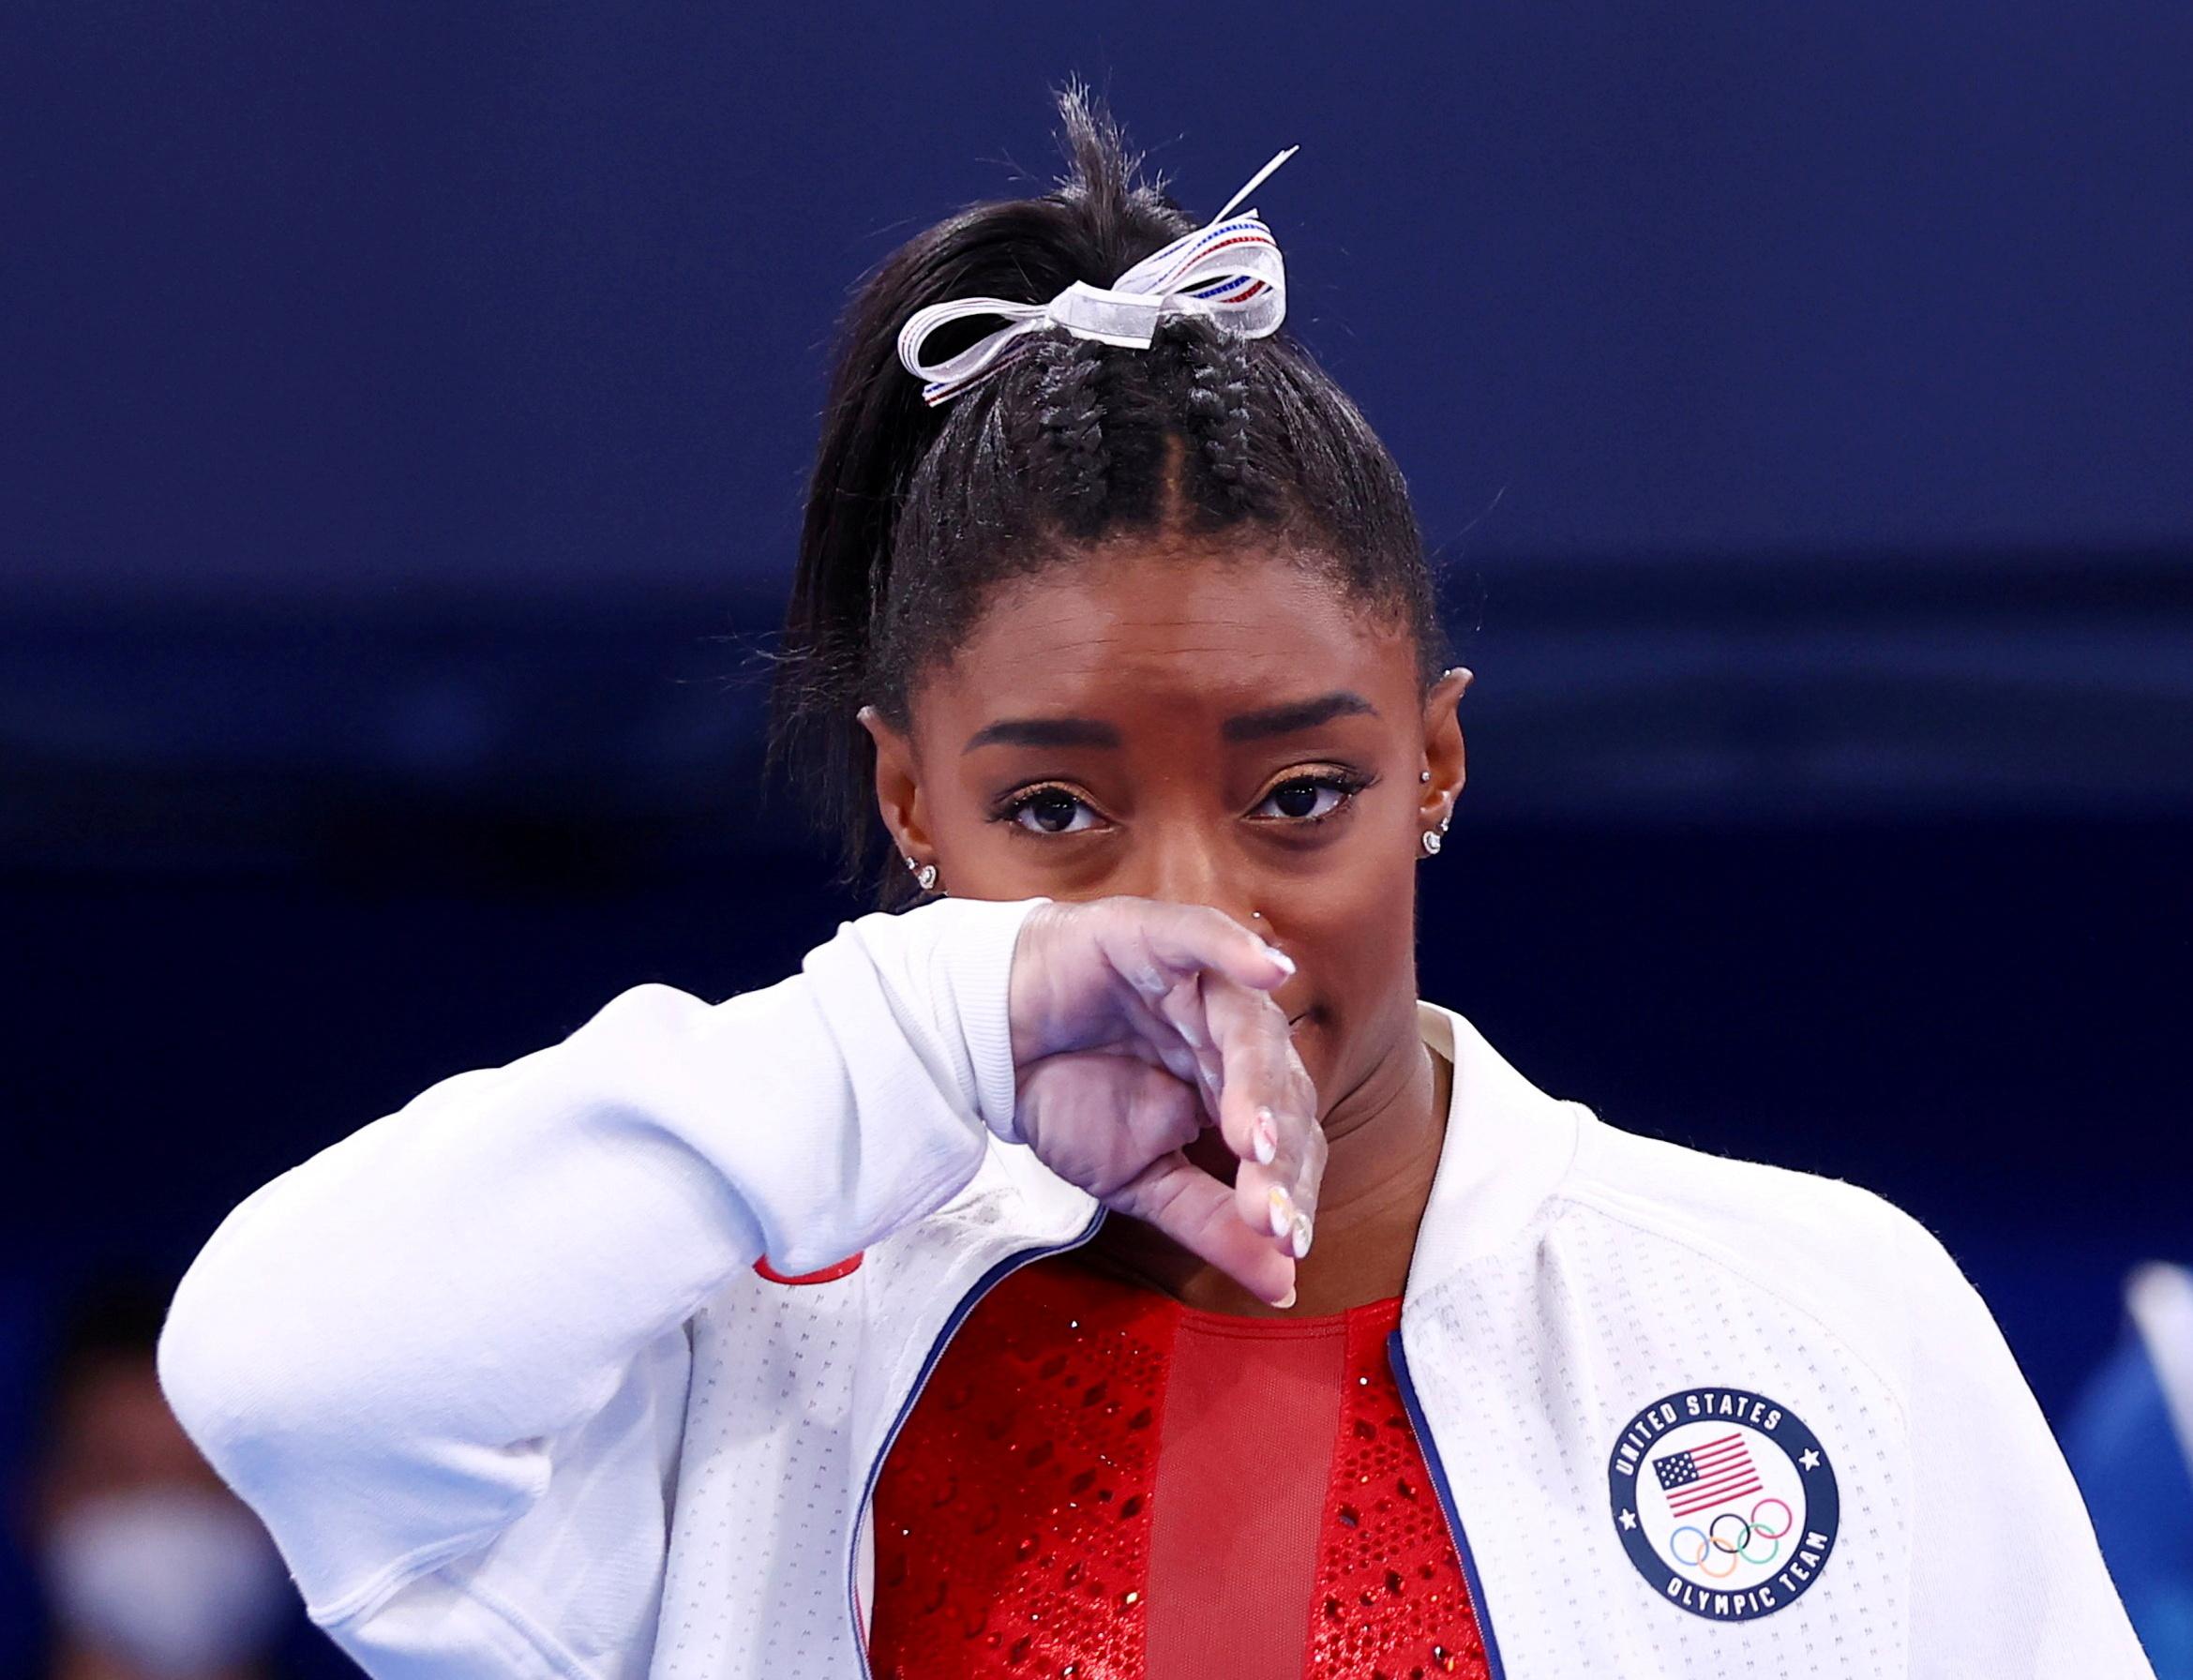 Tokyo 2020 Olympics - Gymnastics - Artistic - Women's Team - Final - Ariake Gymnastics Centre, Tokyo, Japan - July 27, 2021. Simone Biles of the United States during the Women's Team Final REUTERS/Mike Blake/File Photo